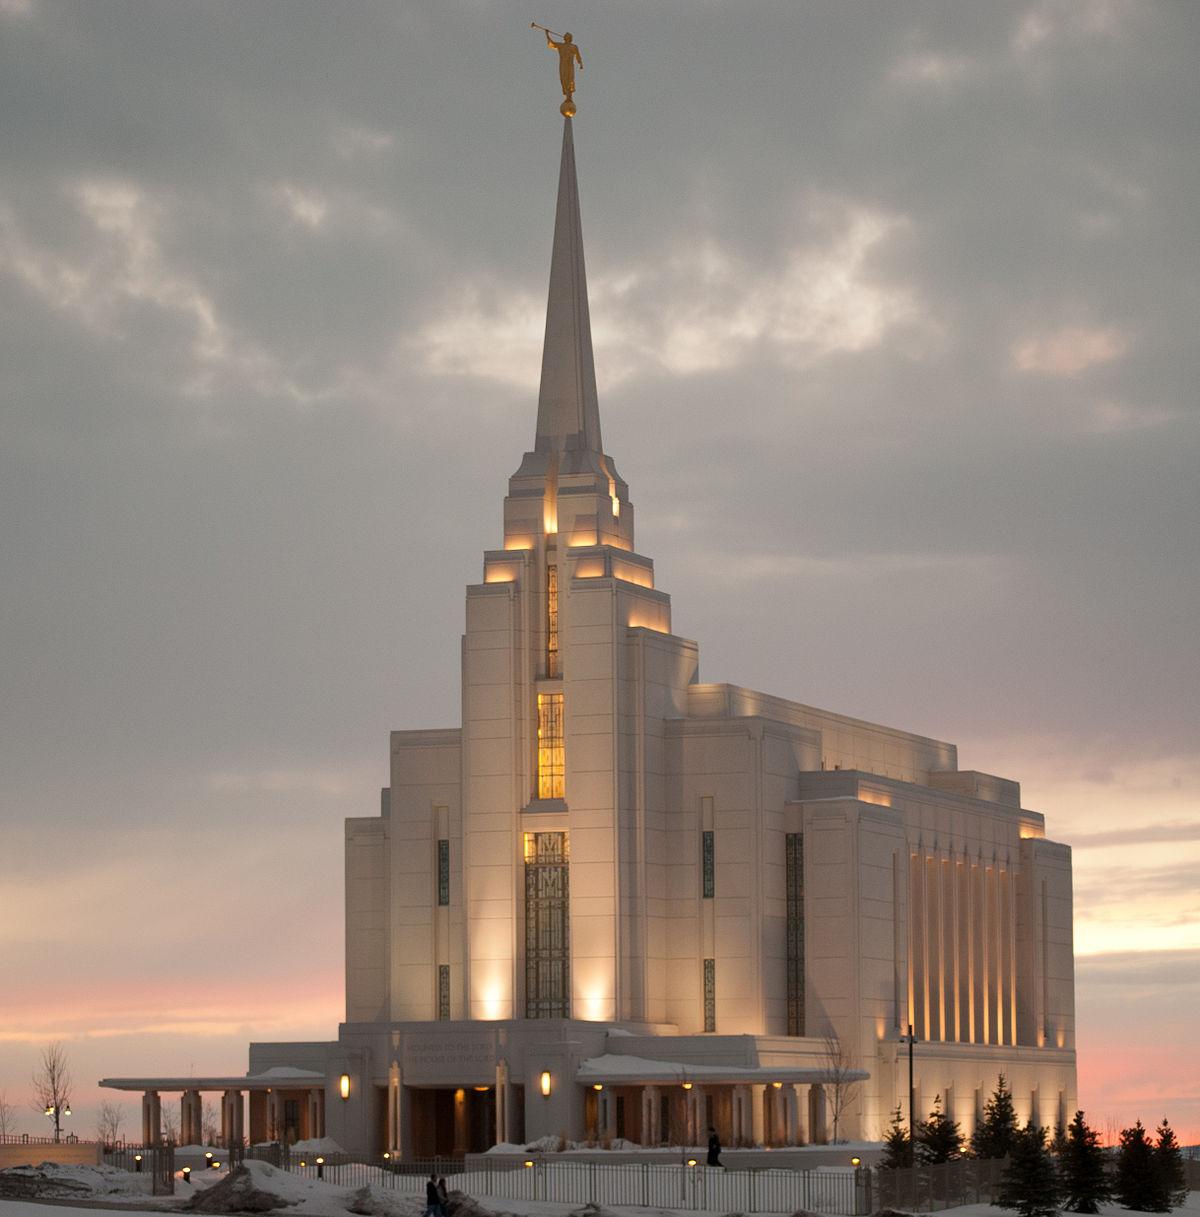 Rexburg Idaho Temple Wikipedia